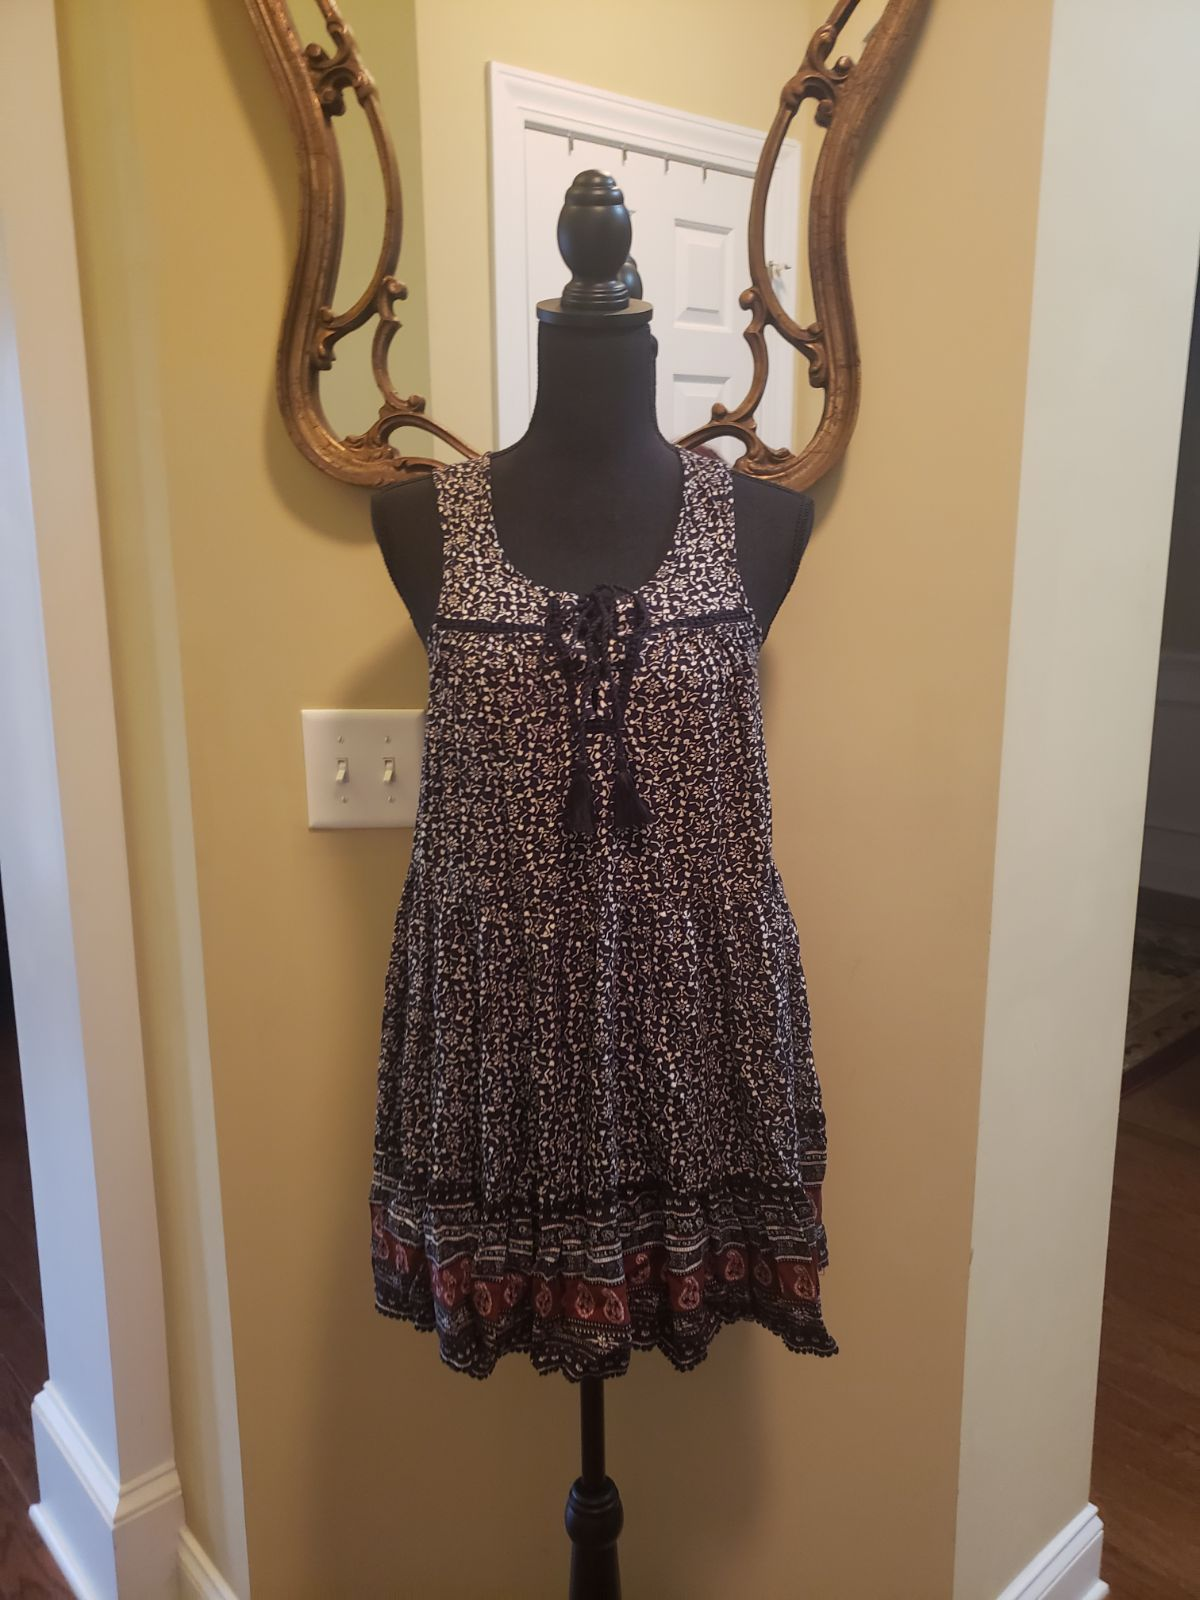 NWT American Eagle AEO Womens AE Boho Spring Sun Floral Dress S,M